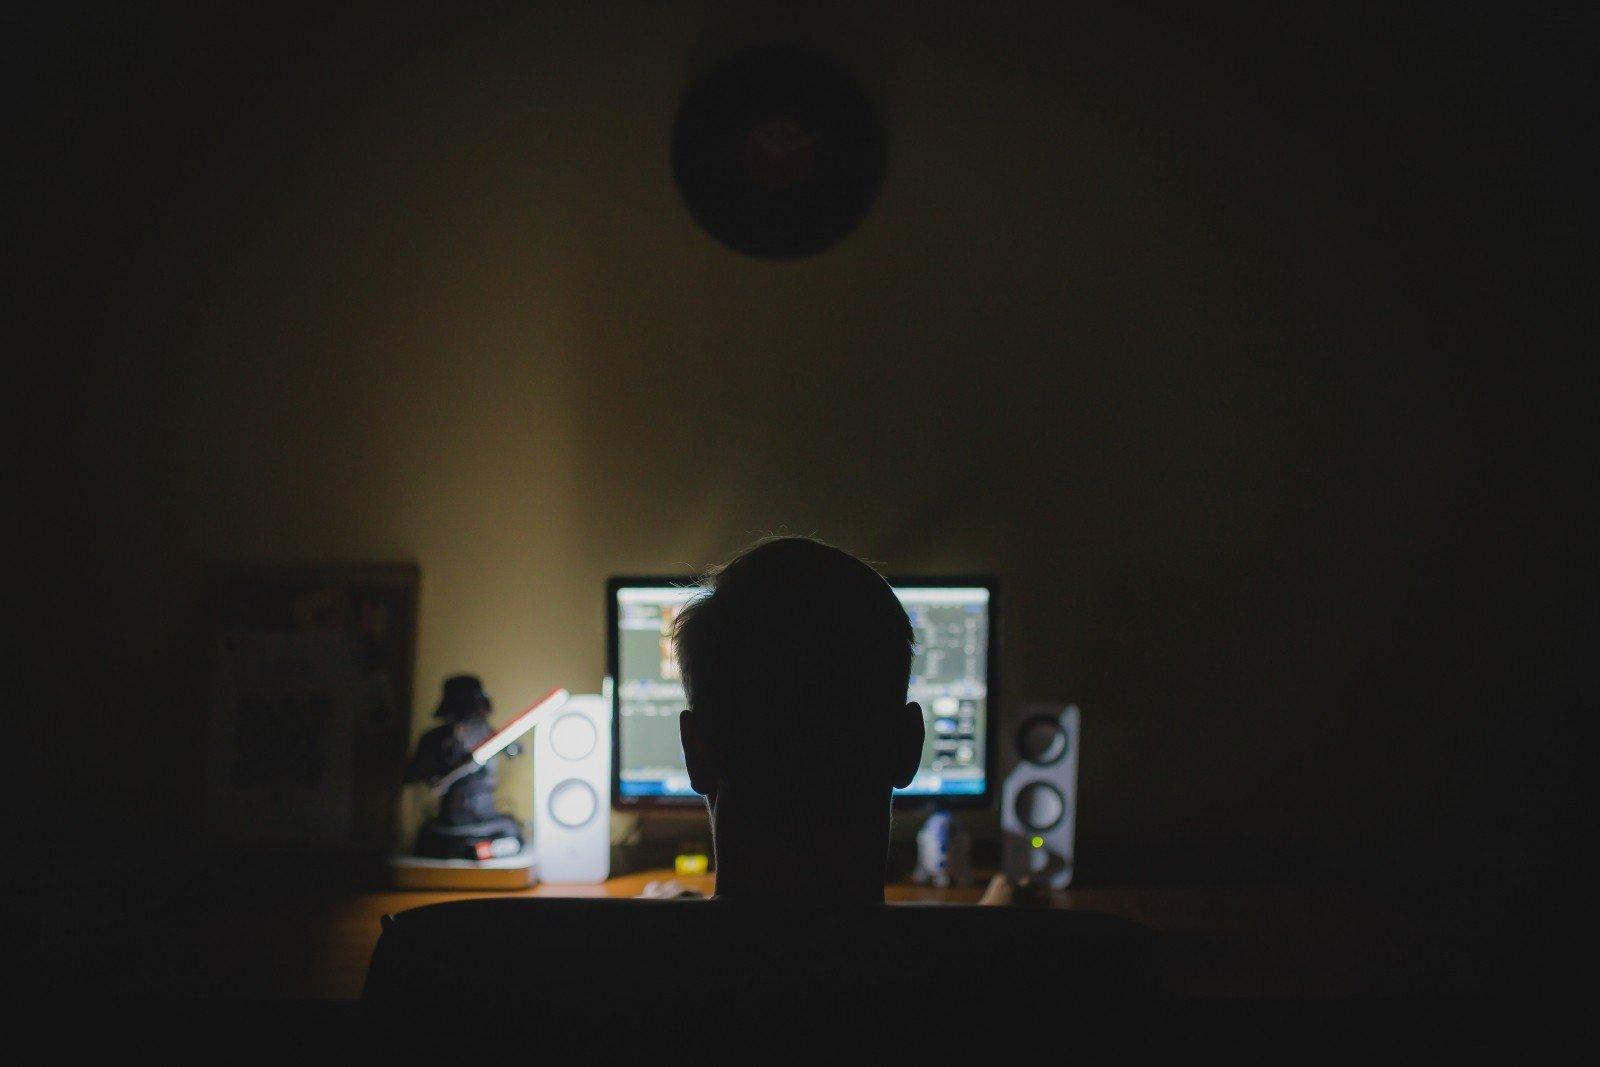 work-desk-computer-night-hacker-anonymous-office.jpg